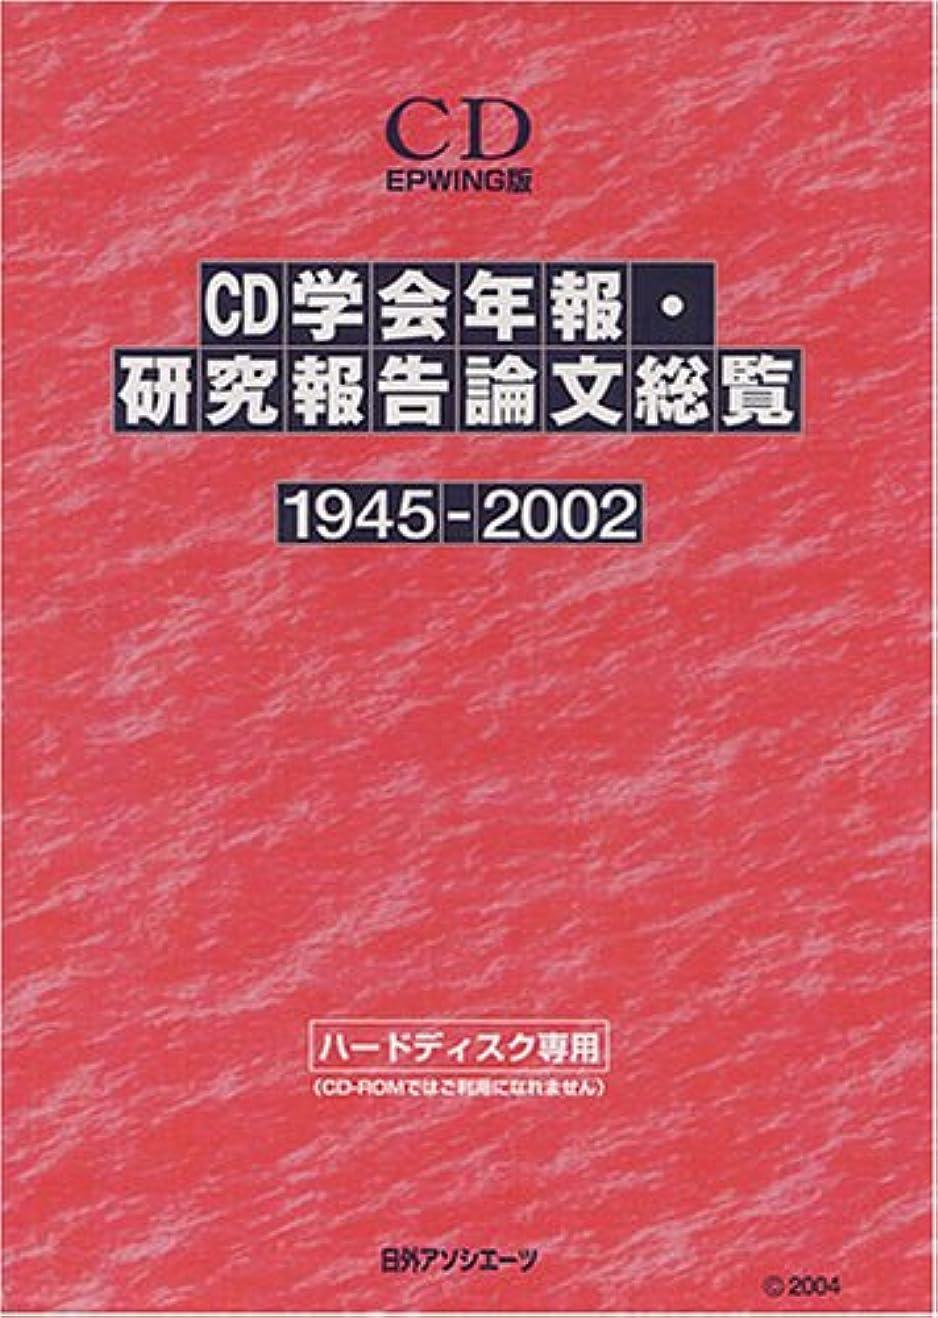 面倒倫理懇願するCD-学会年報?研究報告論文総覧 1945-2002 (EPWING版)